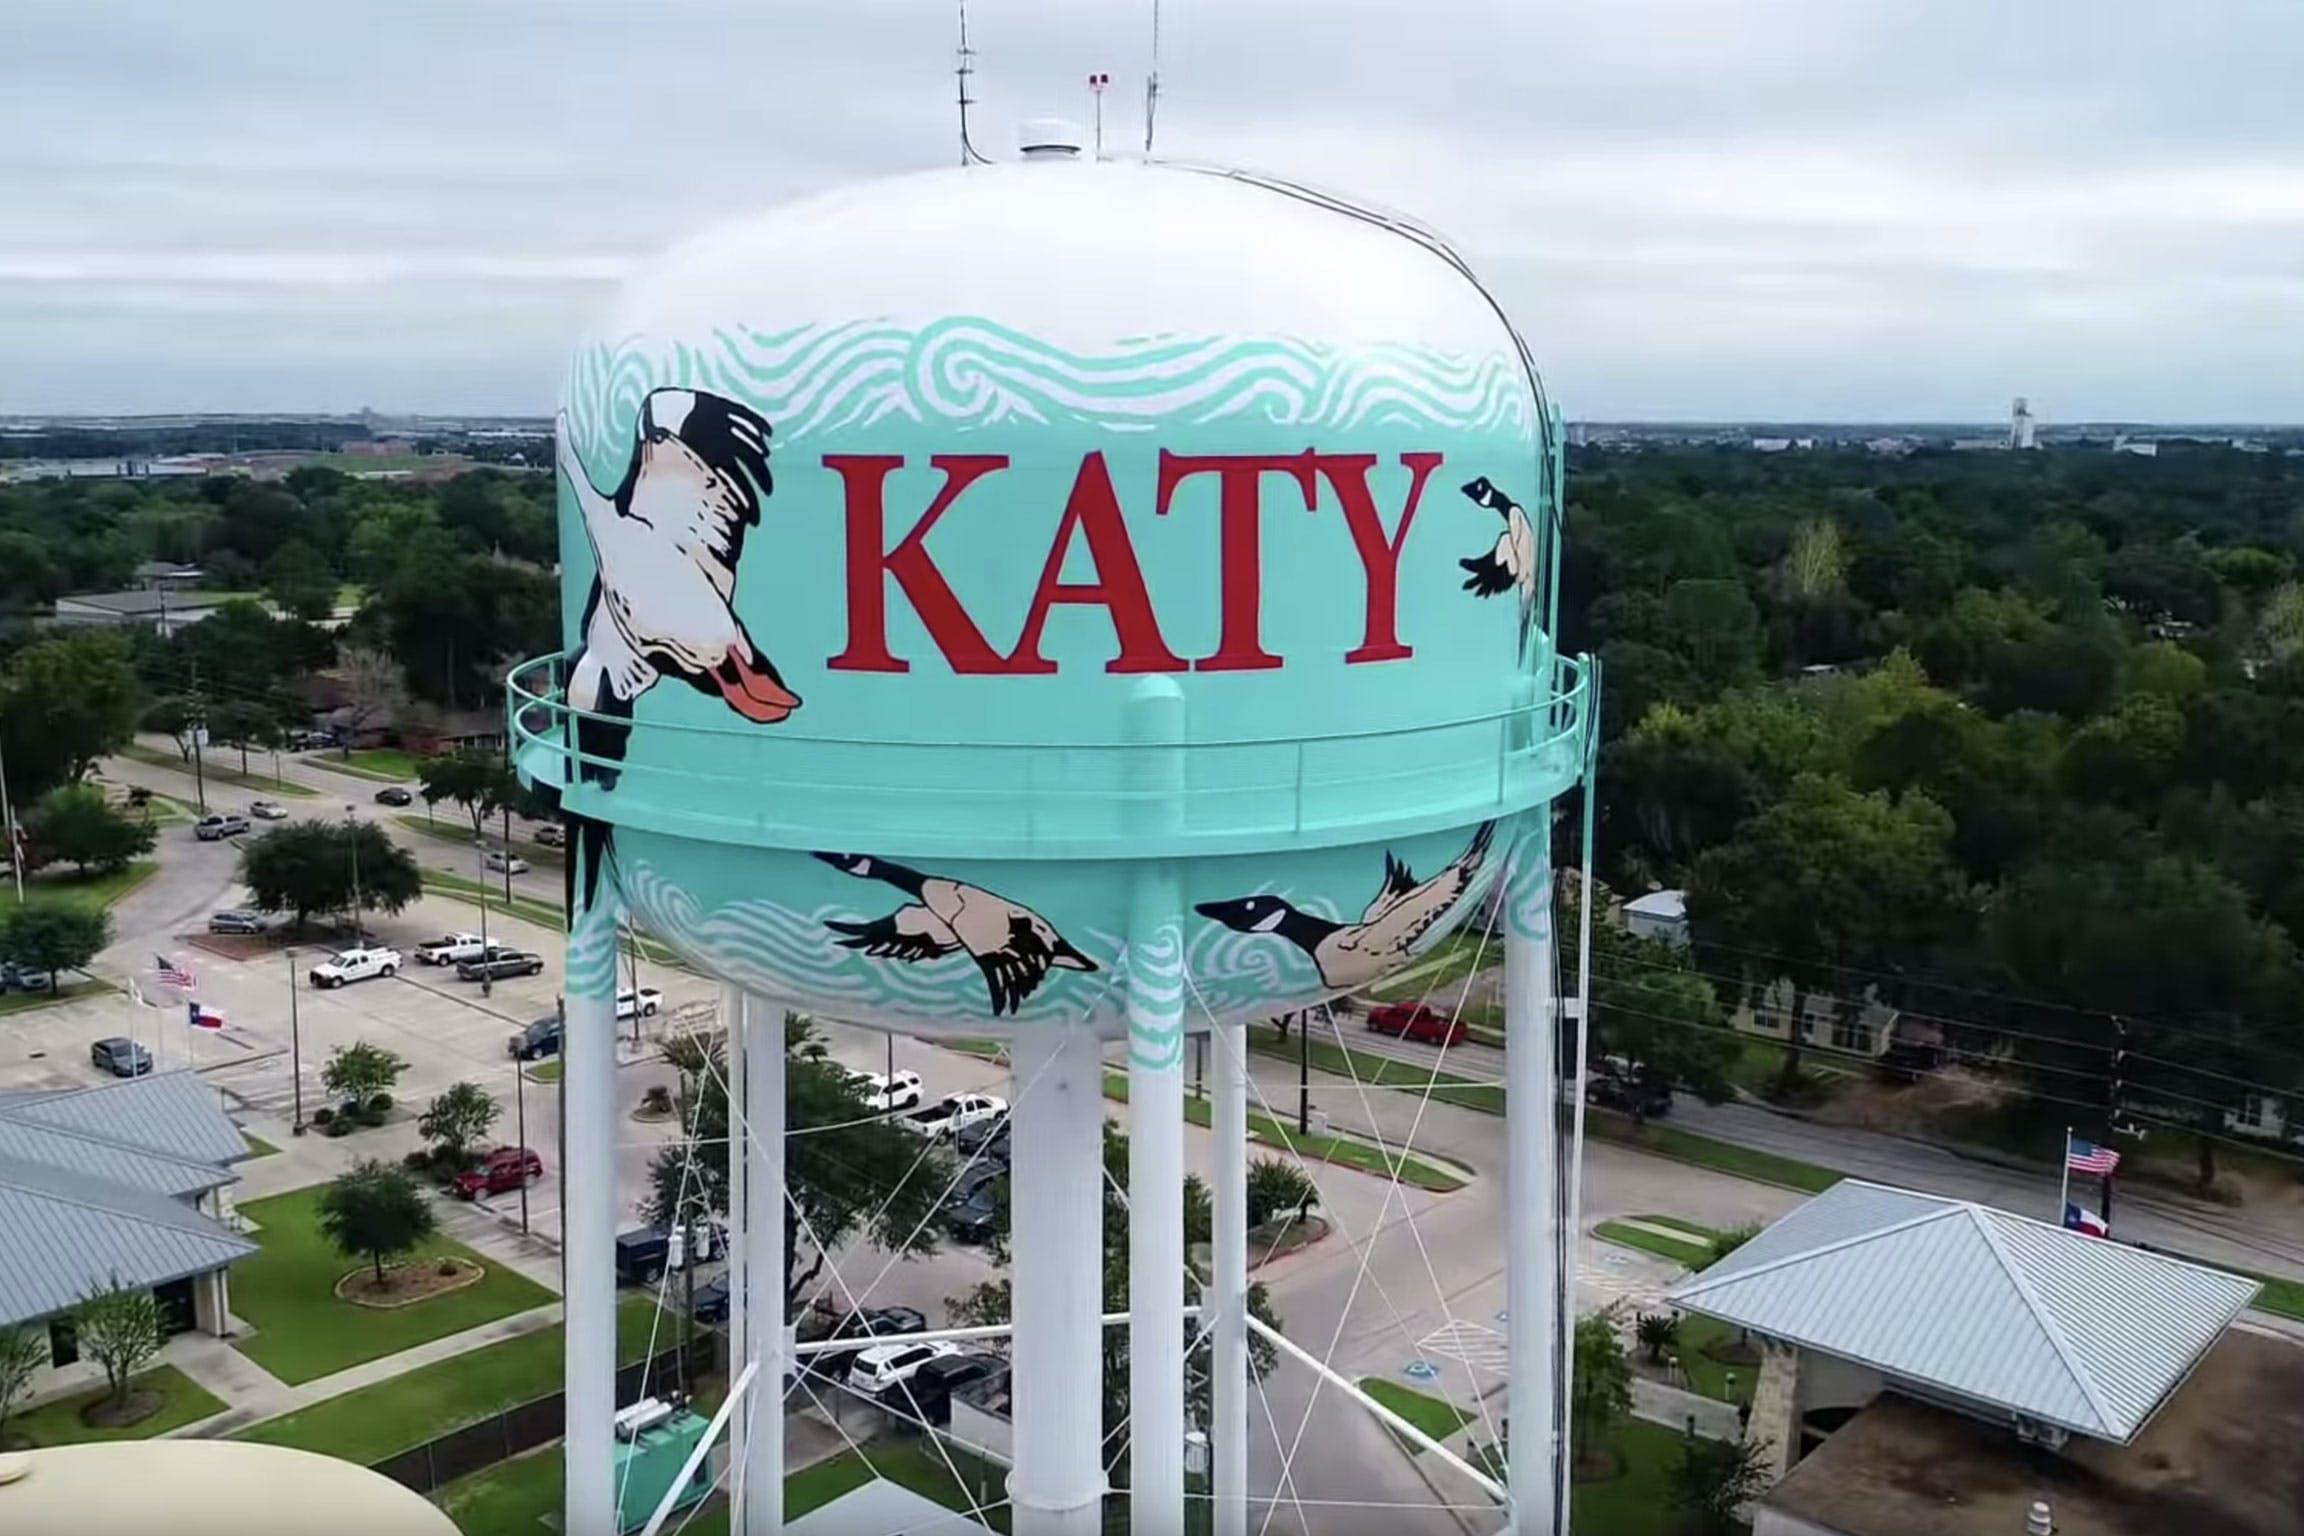 katy-texas-water-tanks-winner-national-award